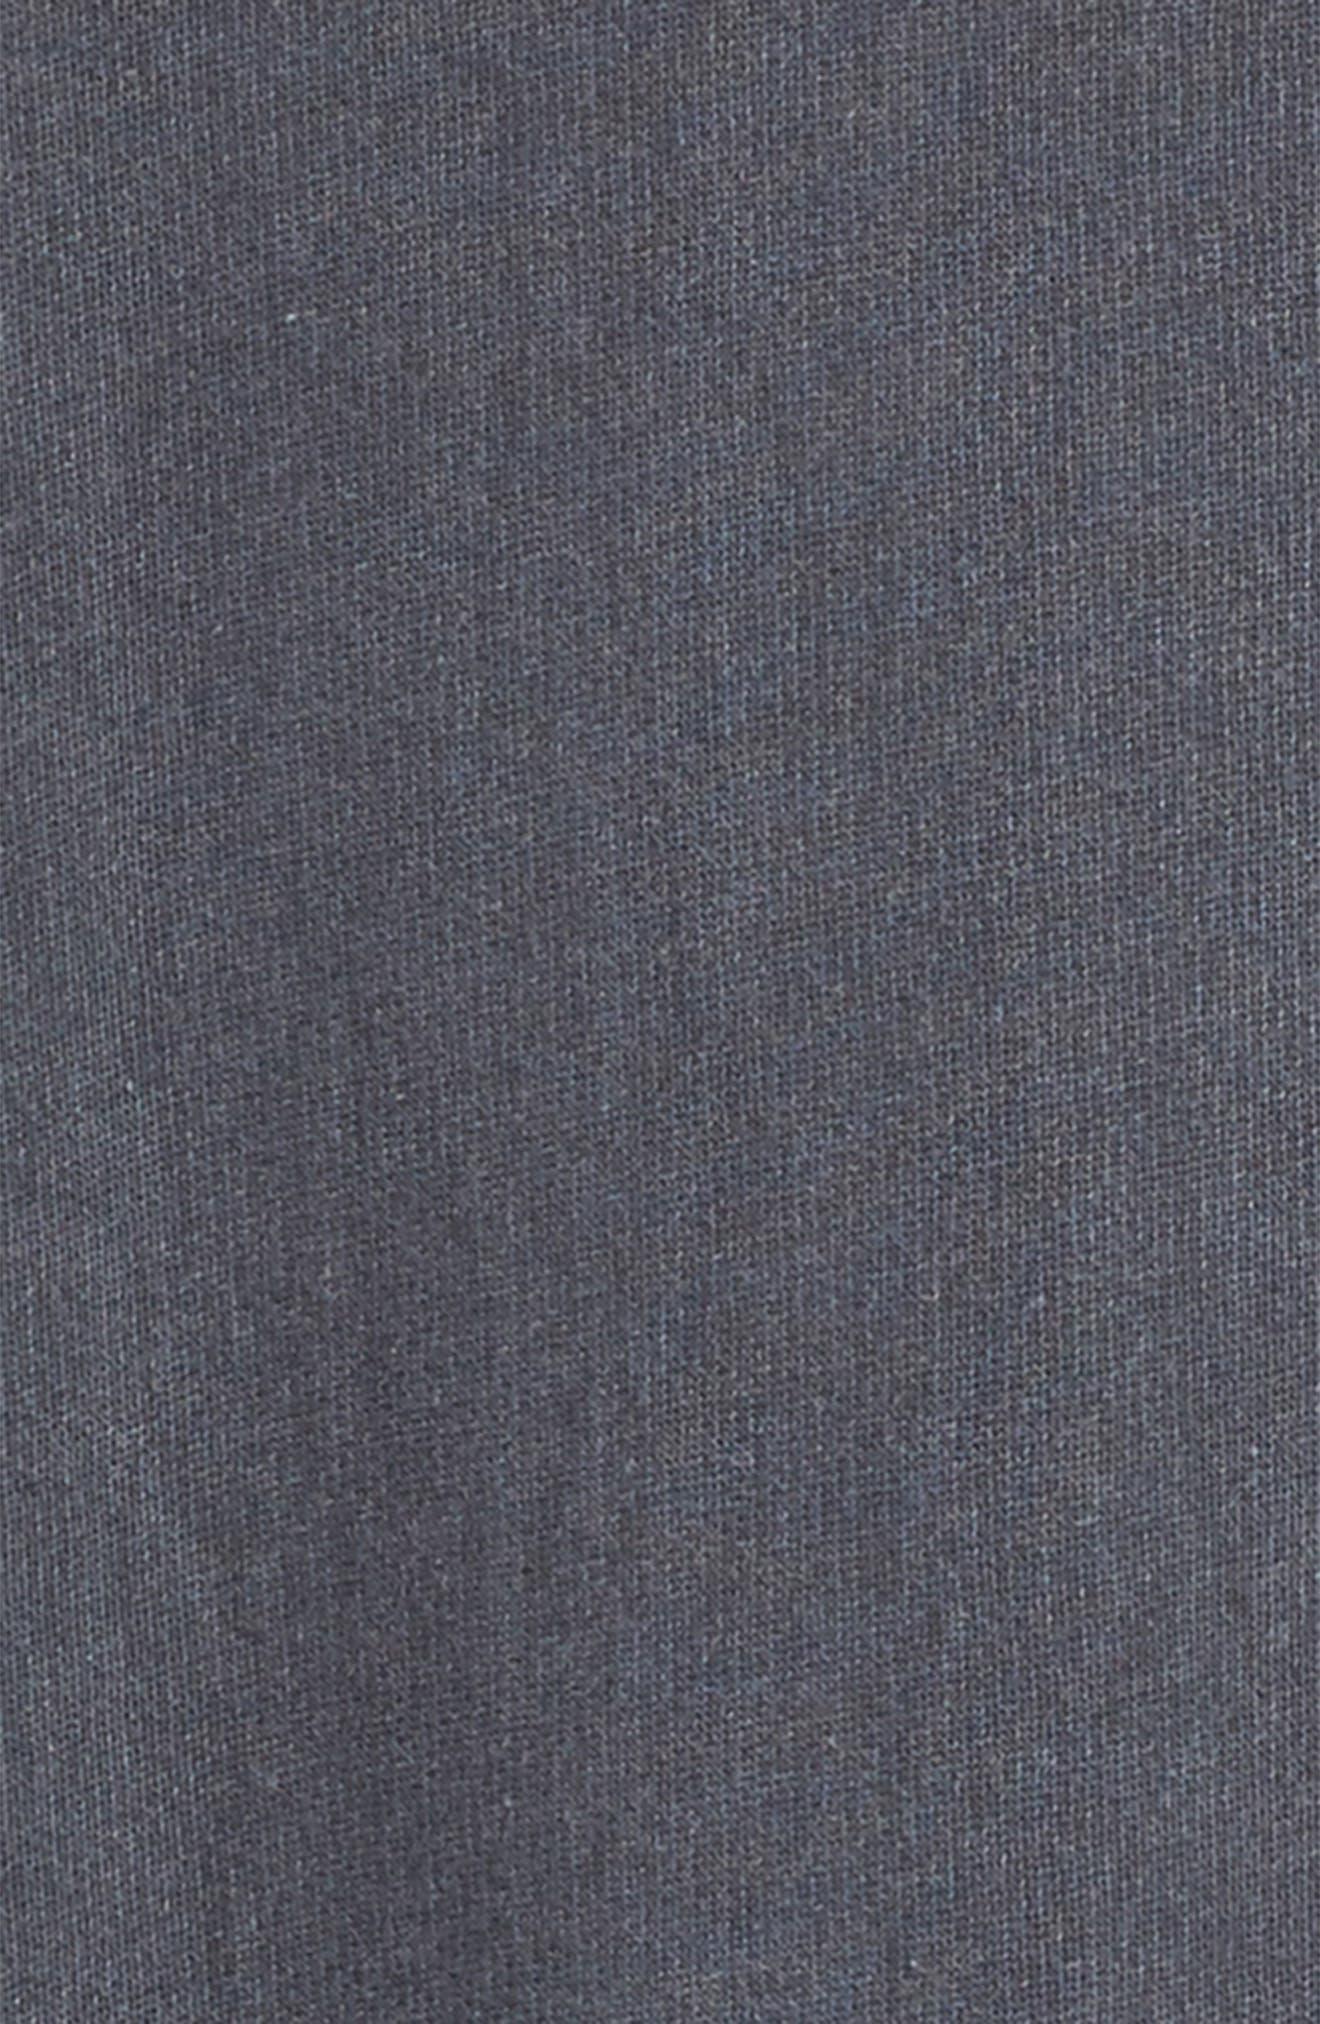 Hooded Fleece Sweatshirt Dress,                             Alternate thumbnail 3, color,                             030